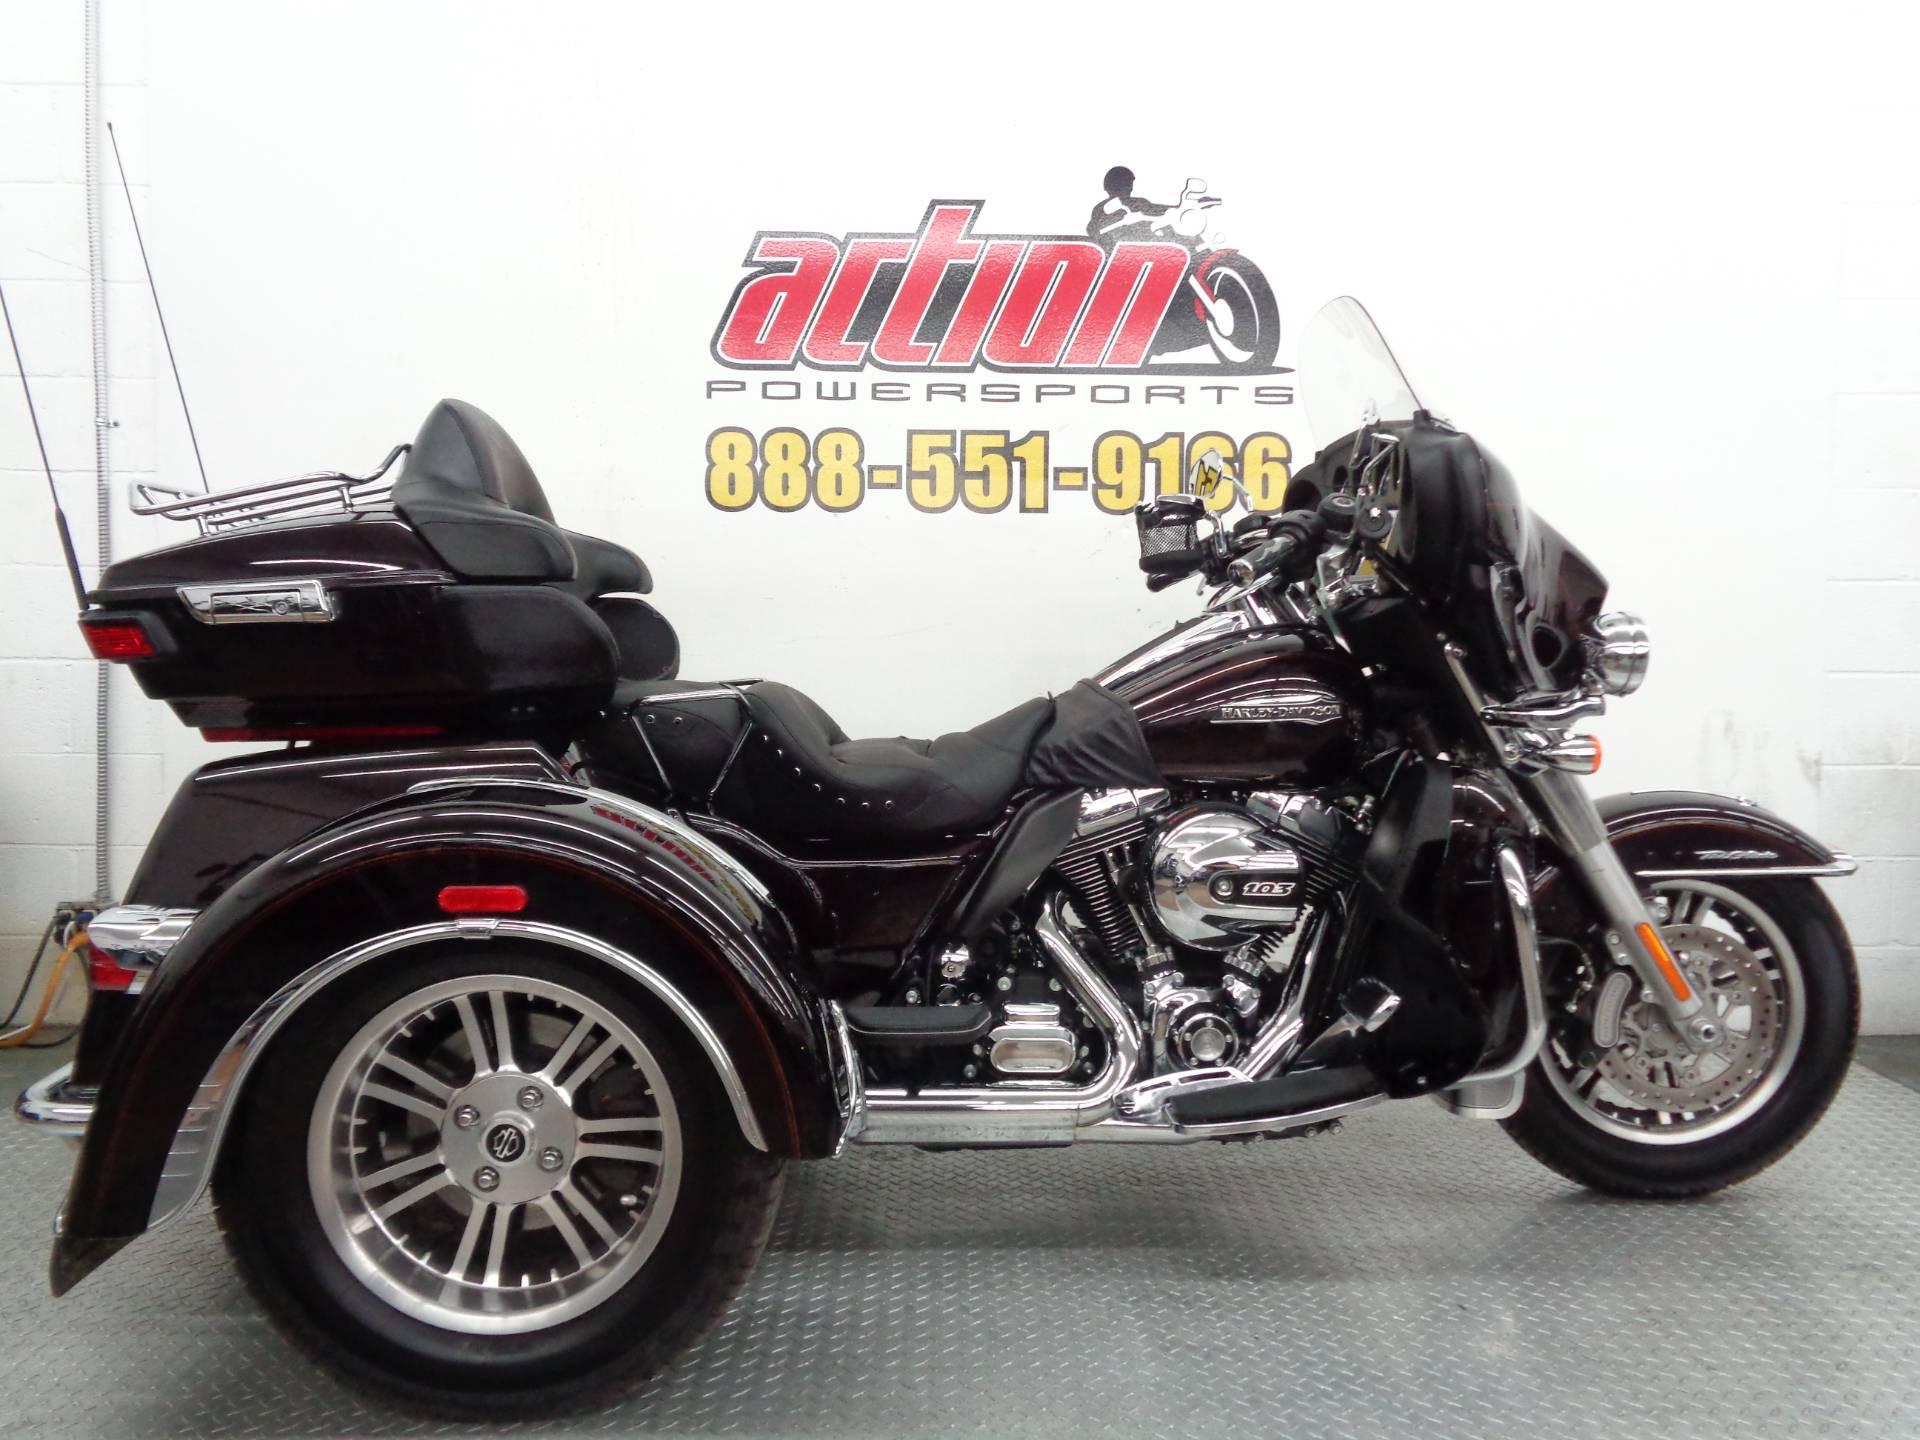 2014 Harley Davidson Tri Glide Ultra: 2014 Harley-Davidson Tri Glide Ultra For Sale Tulsa, OK